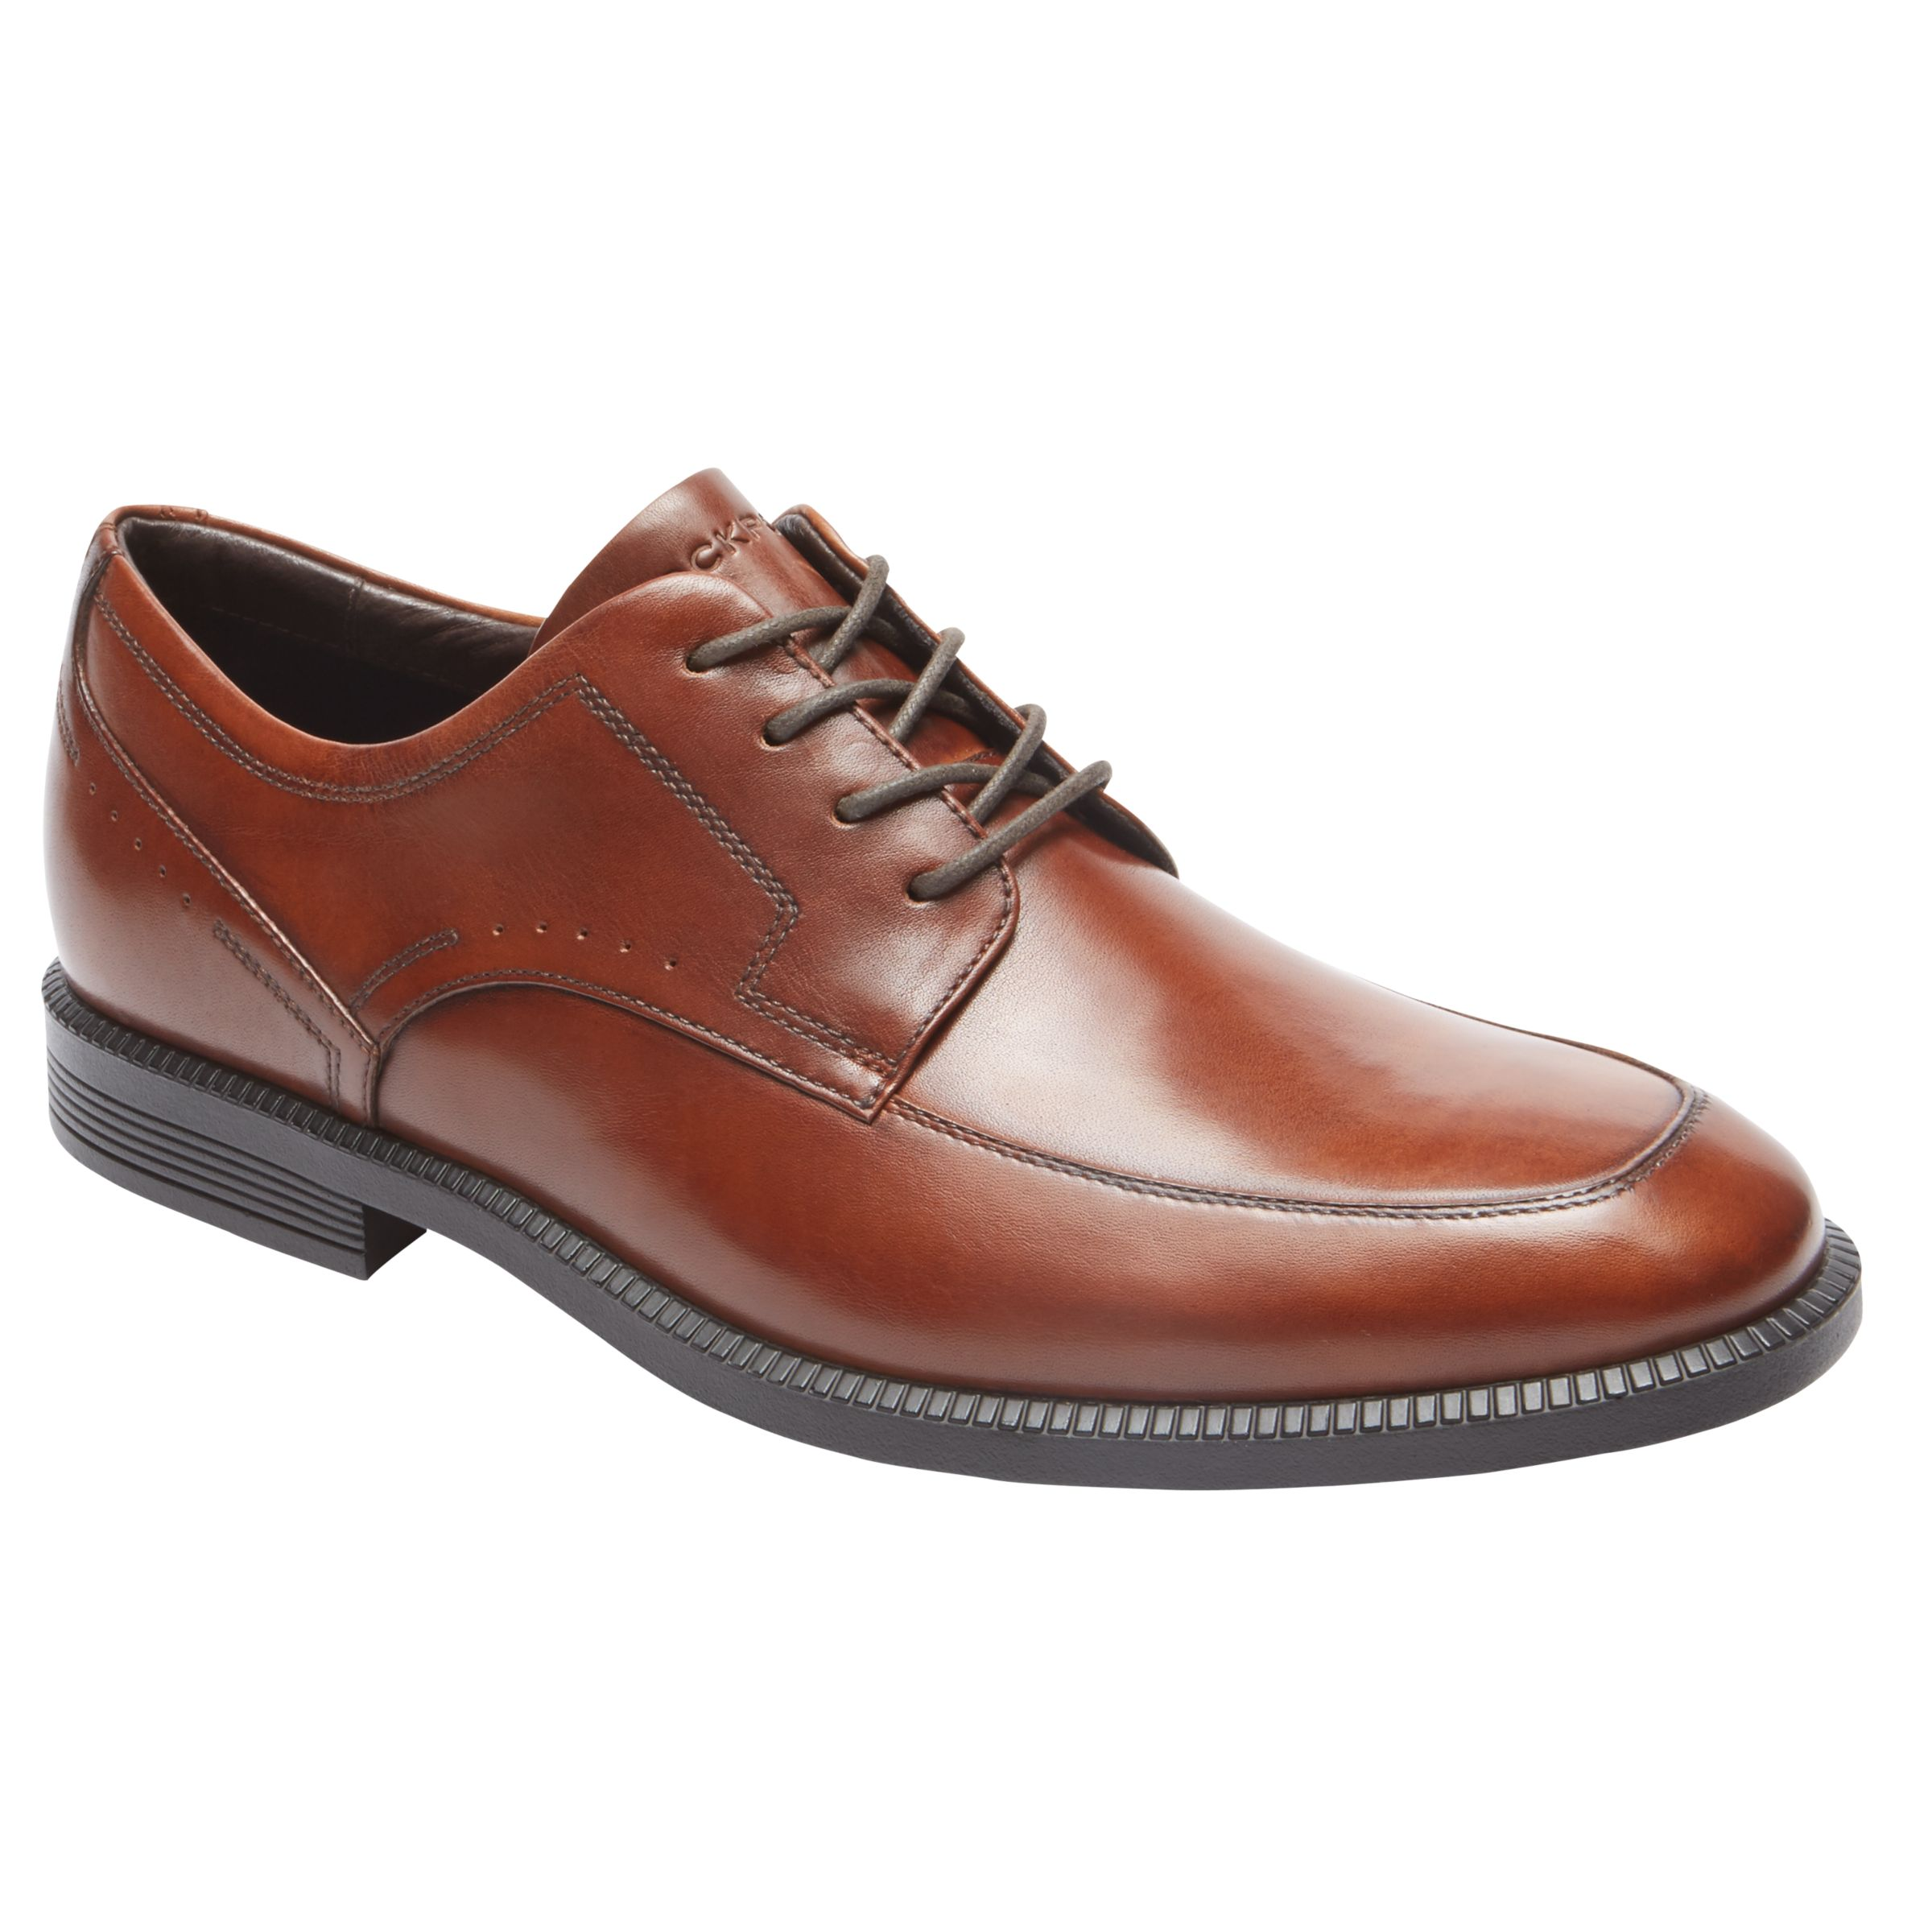 Rockport Rockport Dressports Modern Apron Toe Shoes, Brown